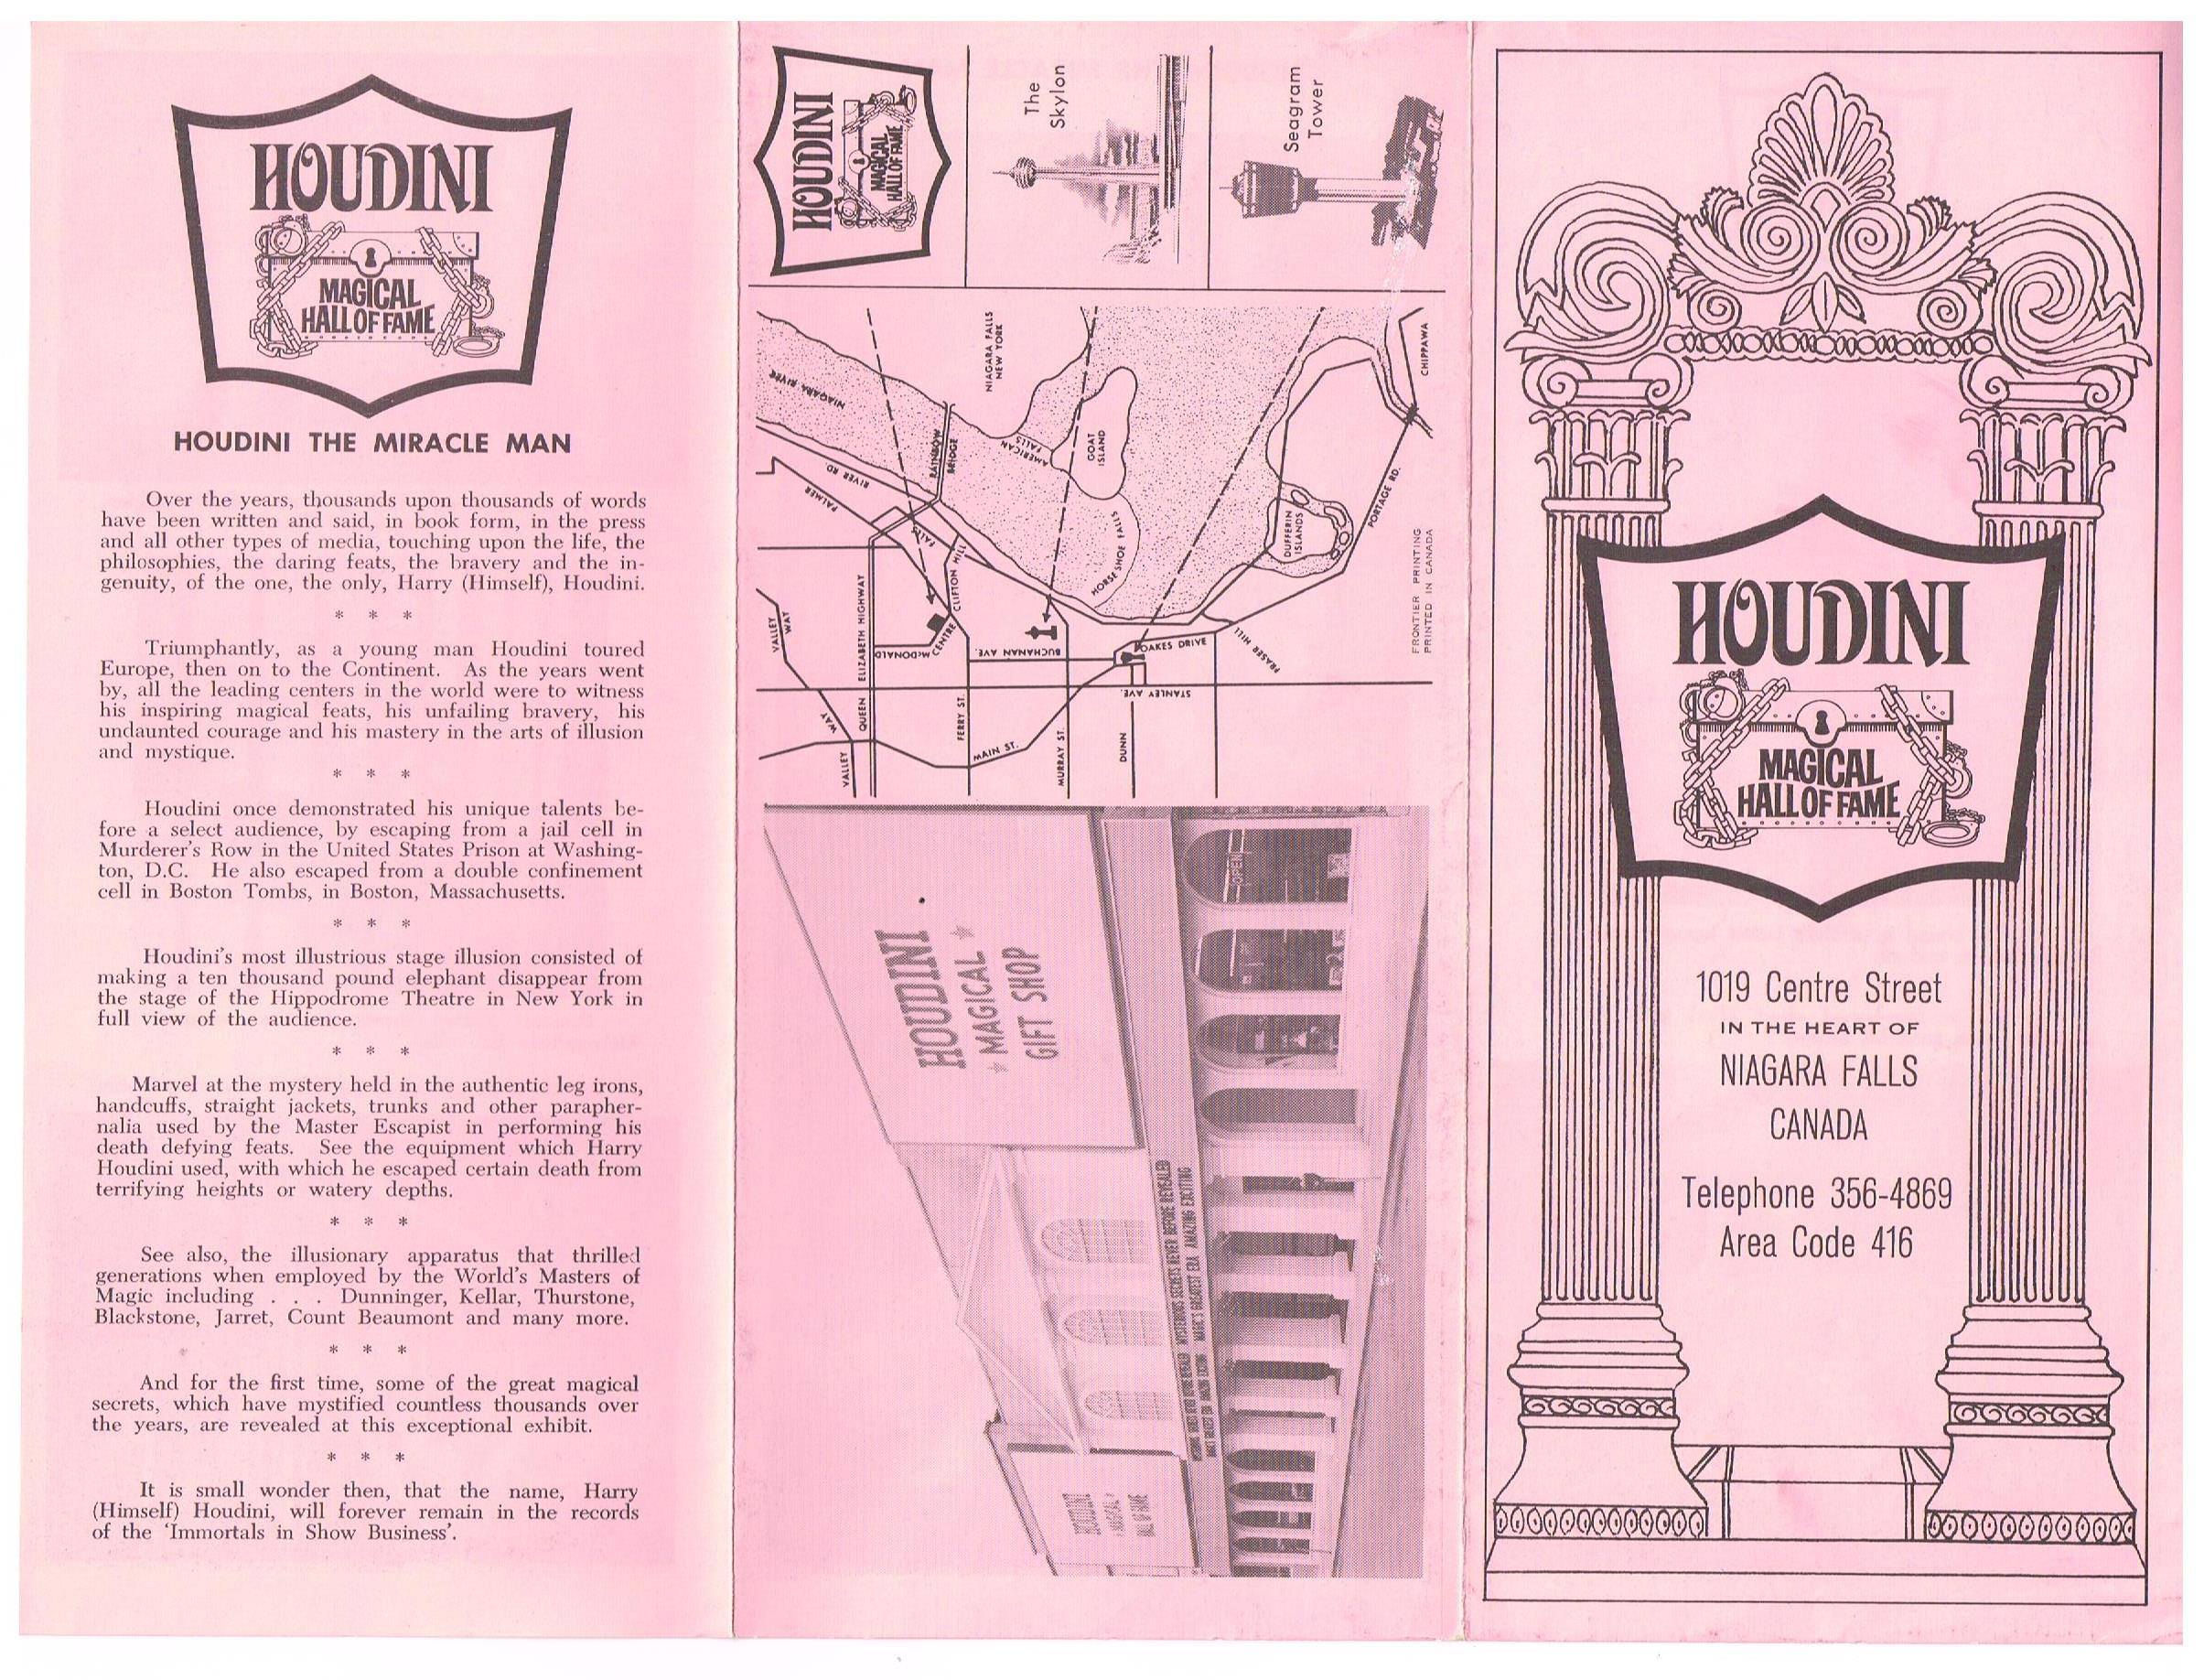 Original Houdini Museum Brochure (Address Misprinted